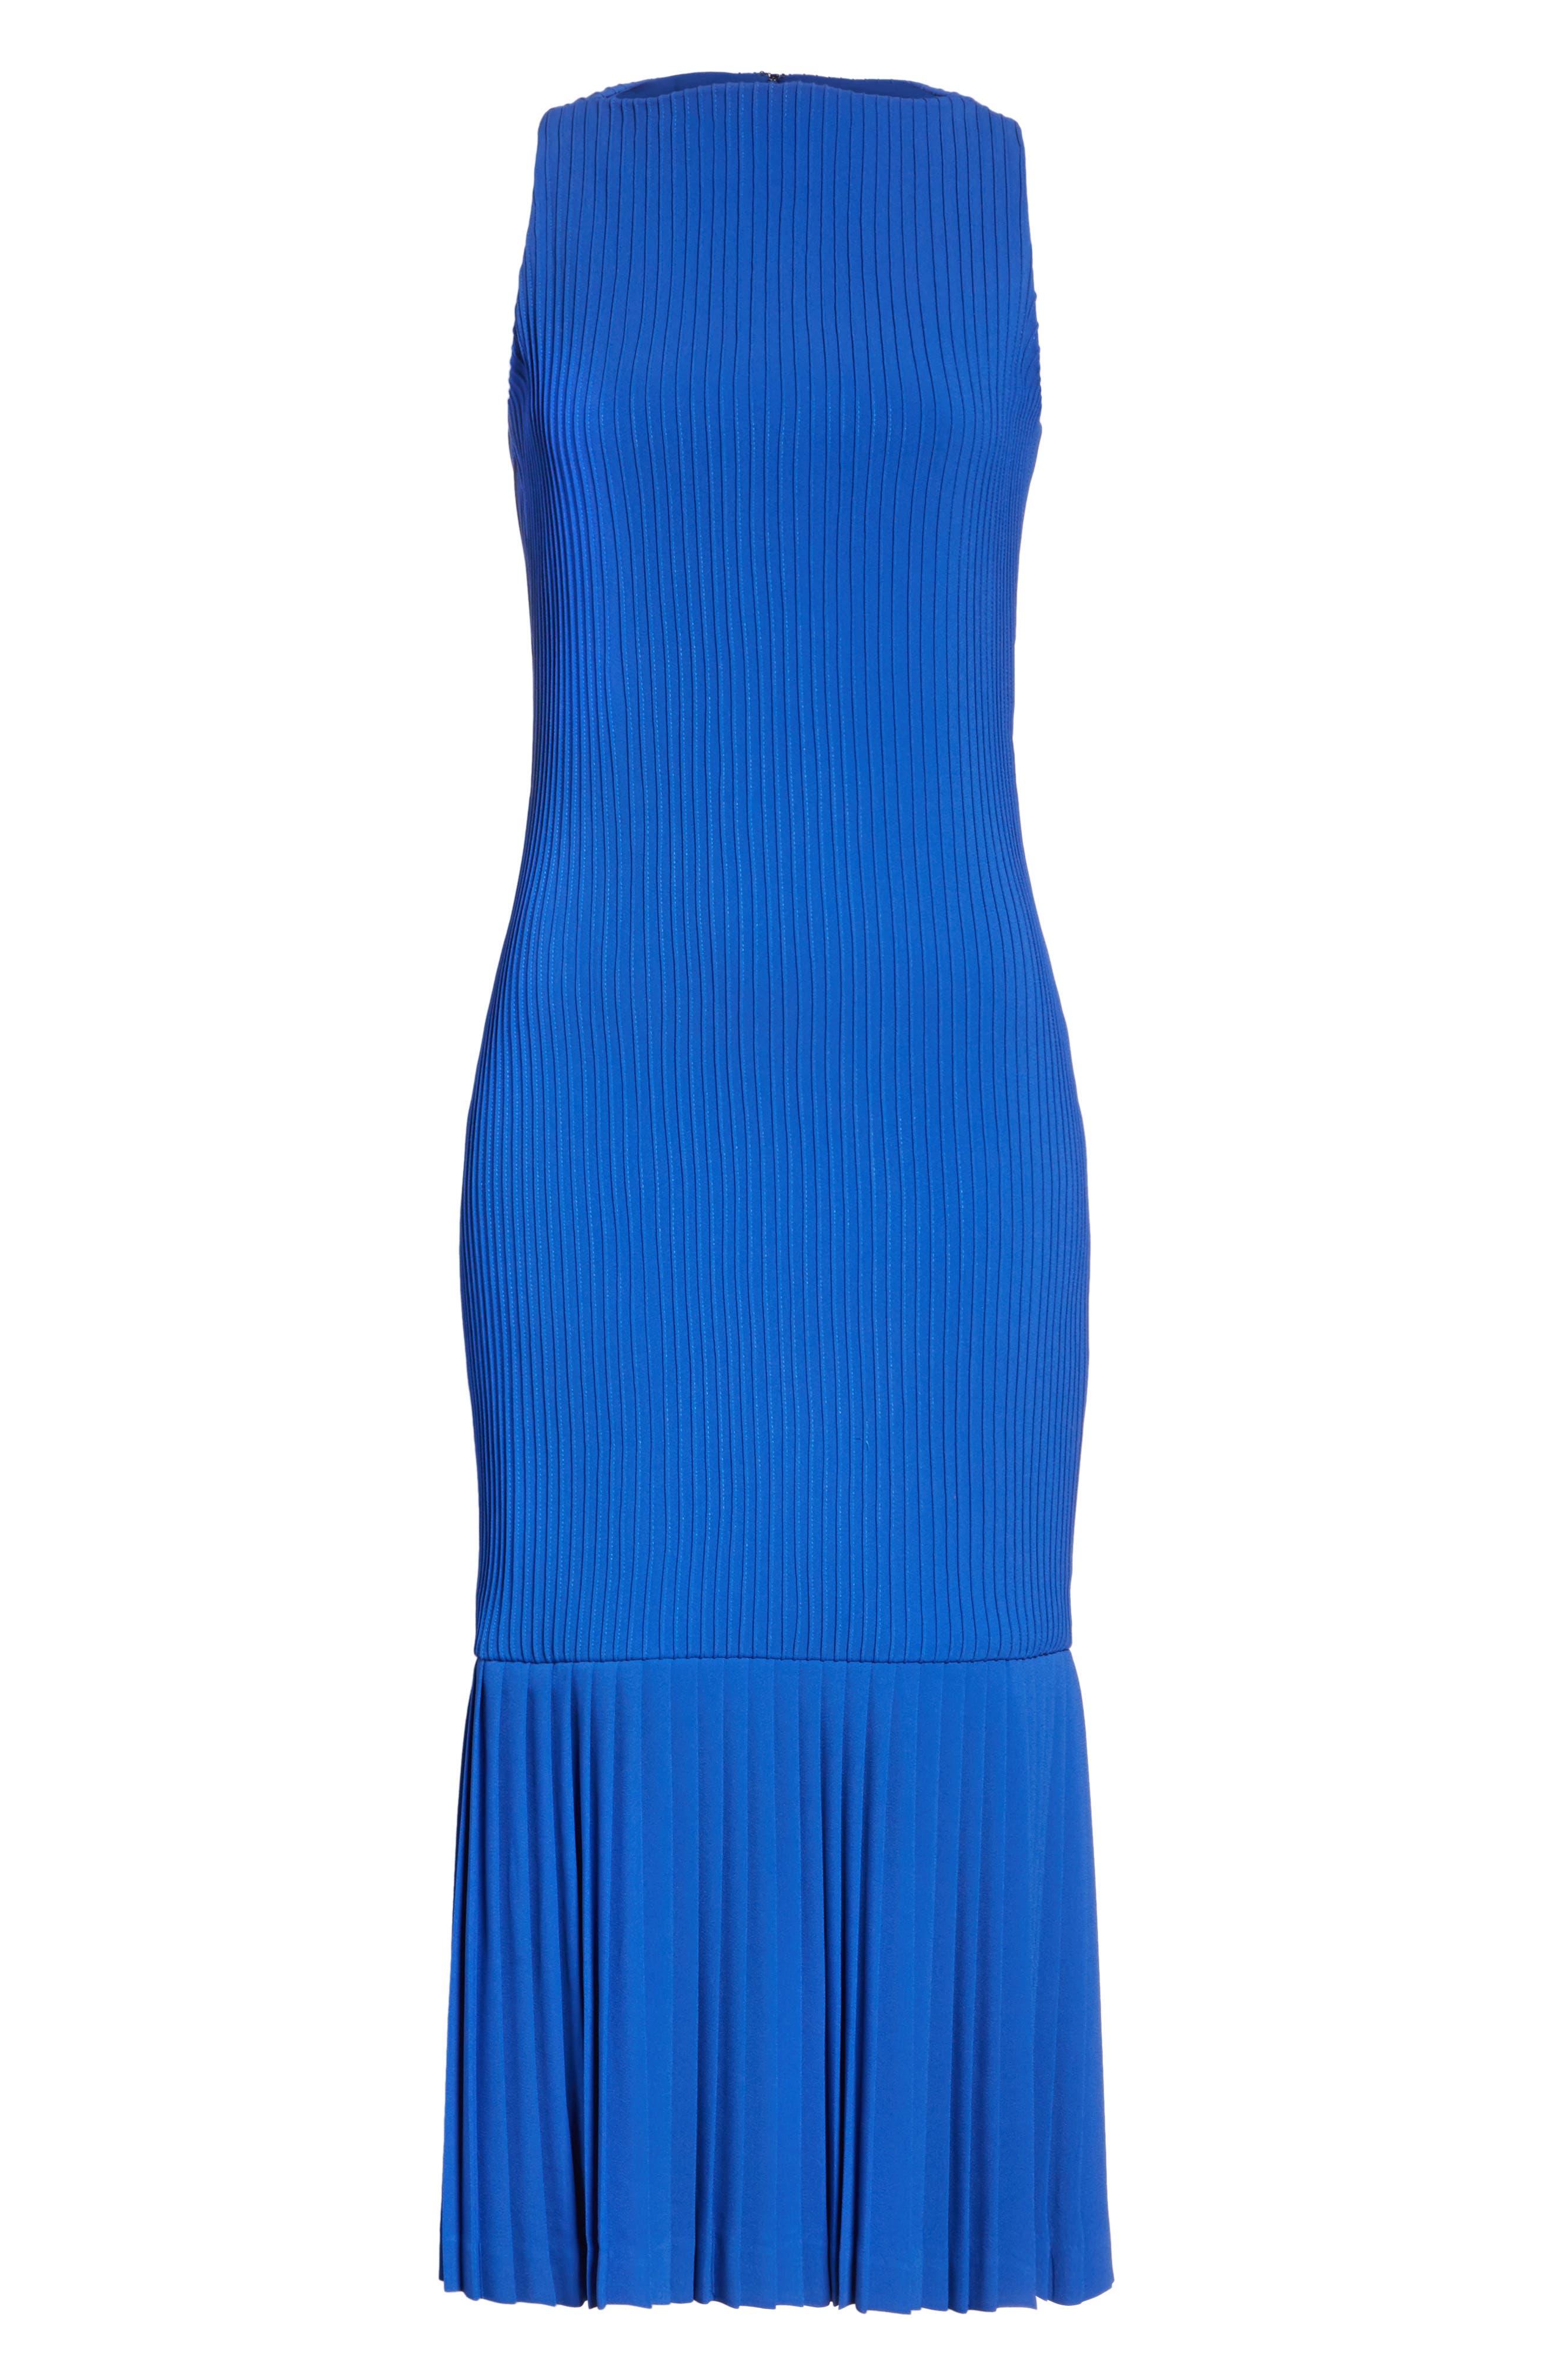 Pintuck Flare Hem Dress,                             Alternate thumbnail 6, color,                             430